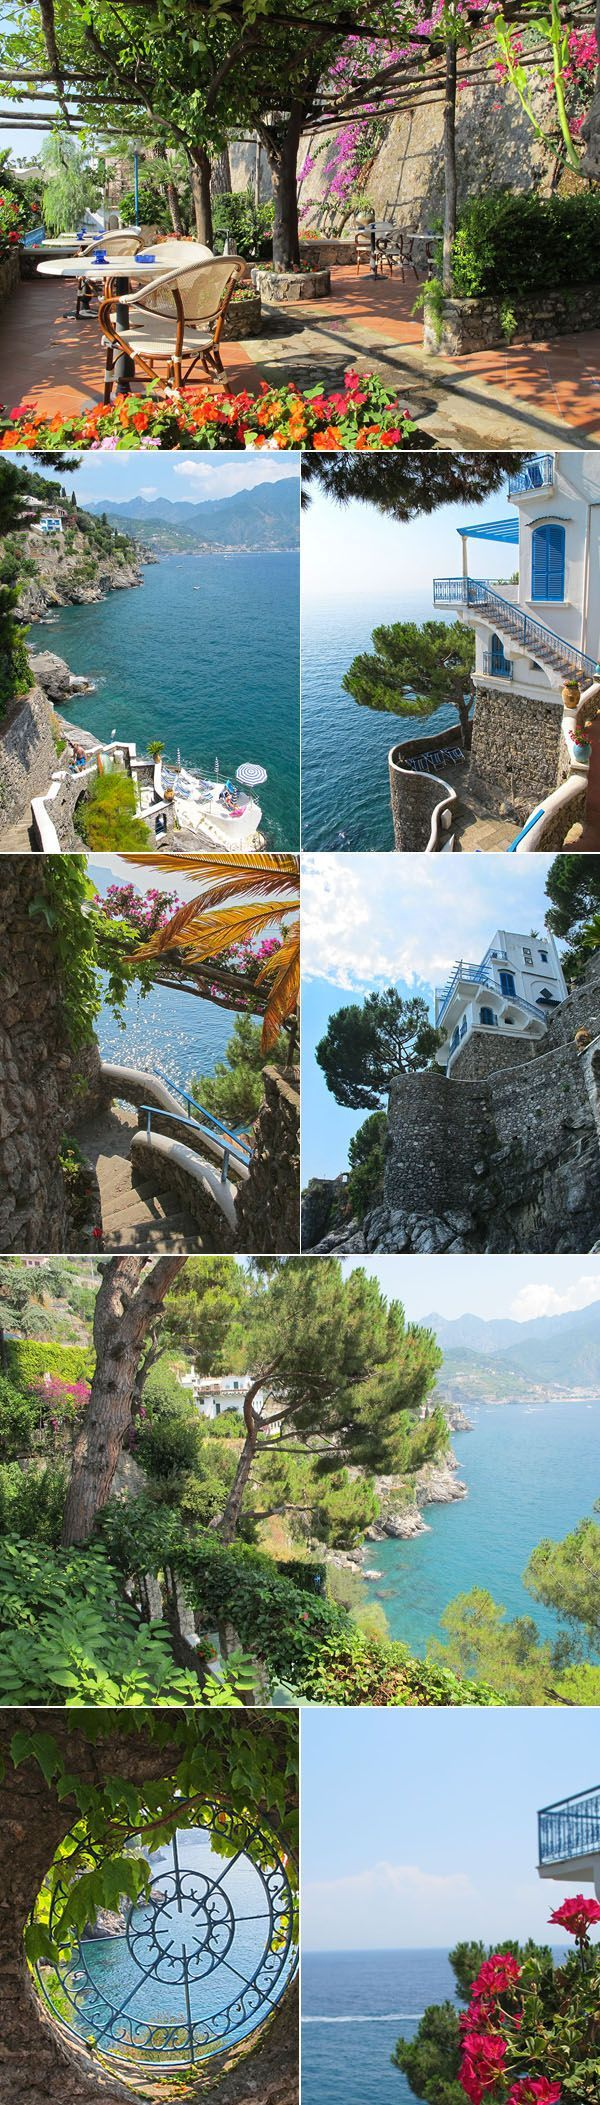 La dolce vita: 9 things to do on the Amalfi coast. Hotel Villa San Michele